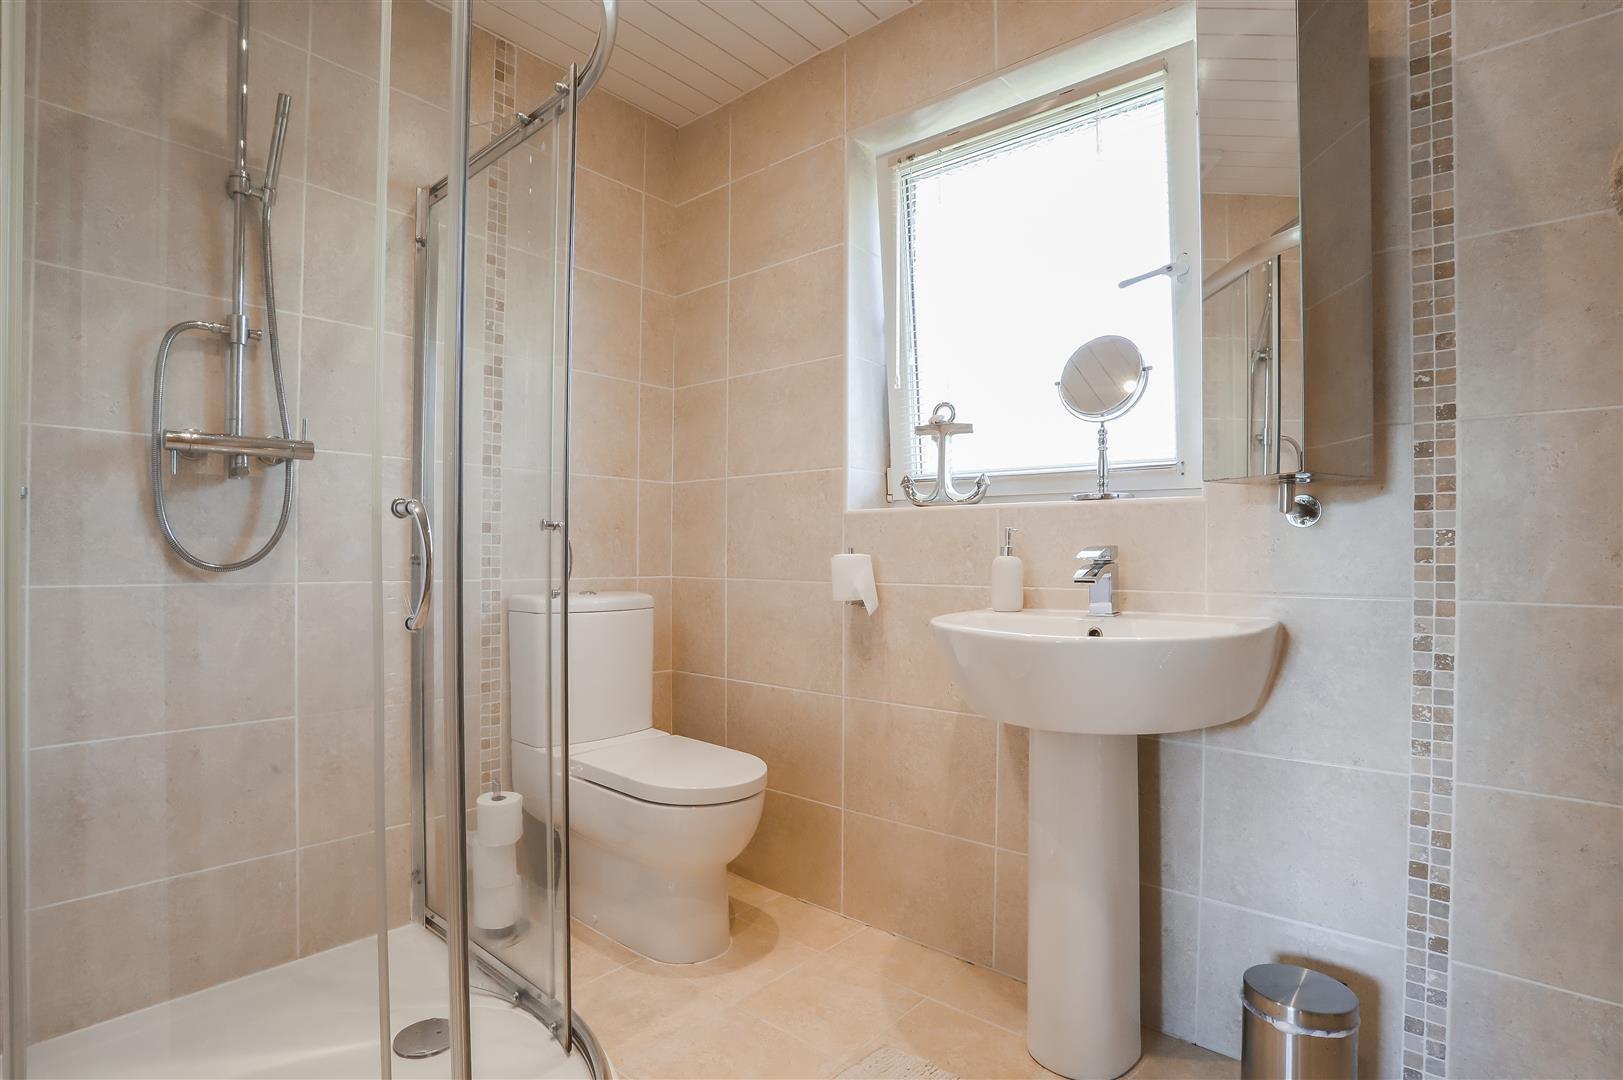 4 Bedroom Semi-detached House For Sale - Image 8